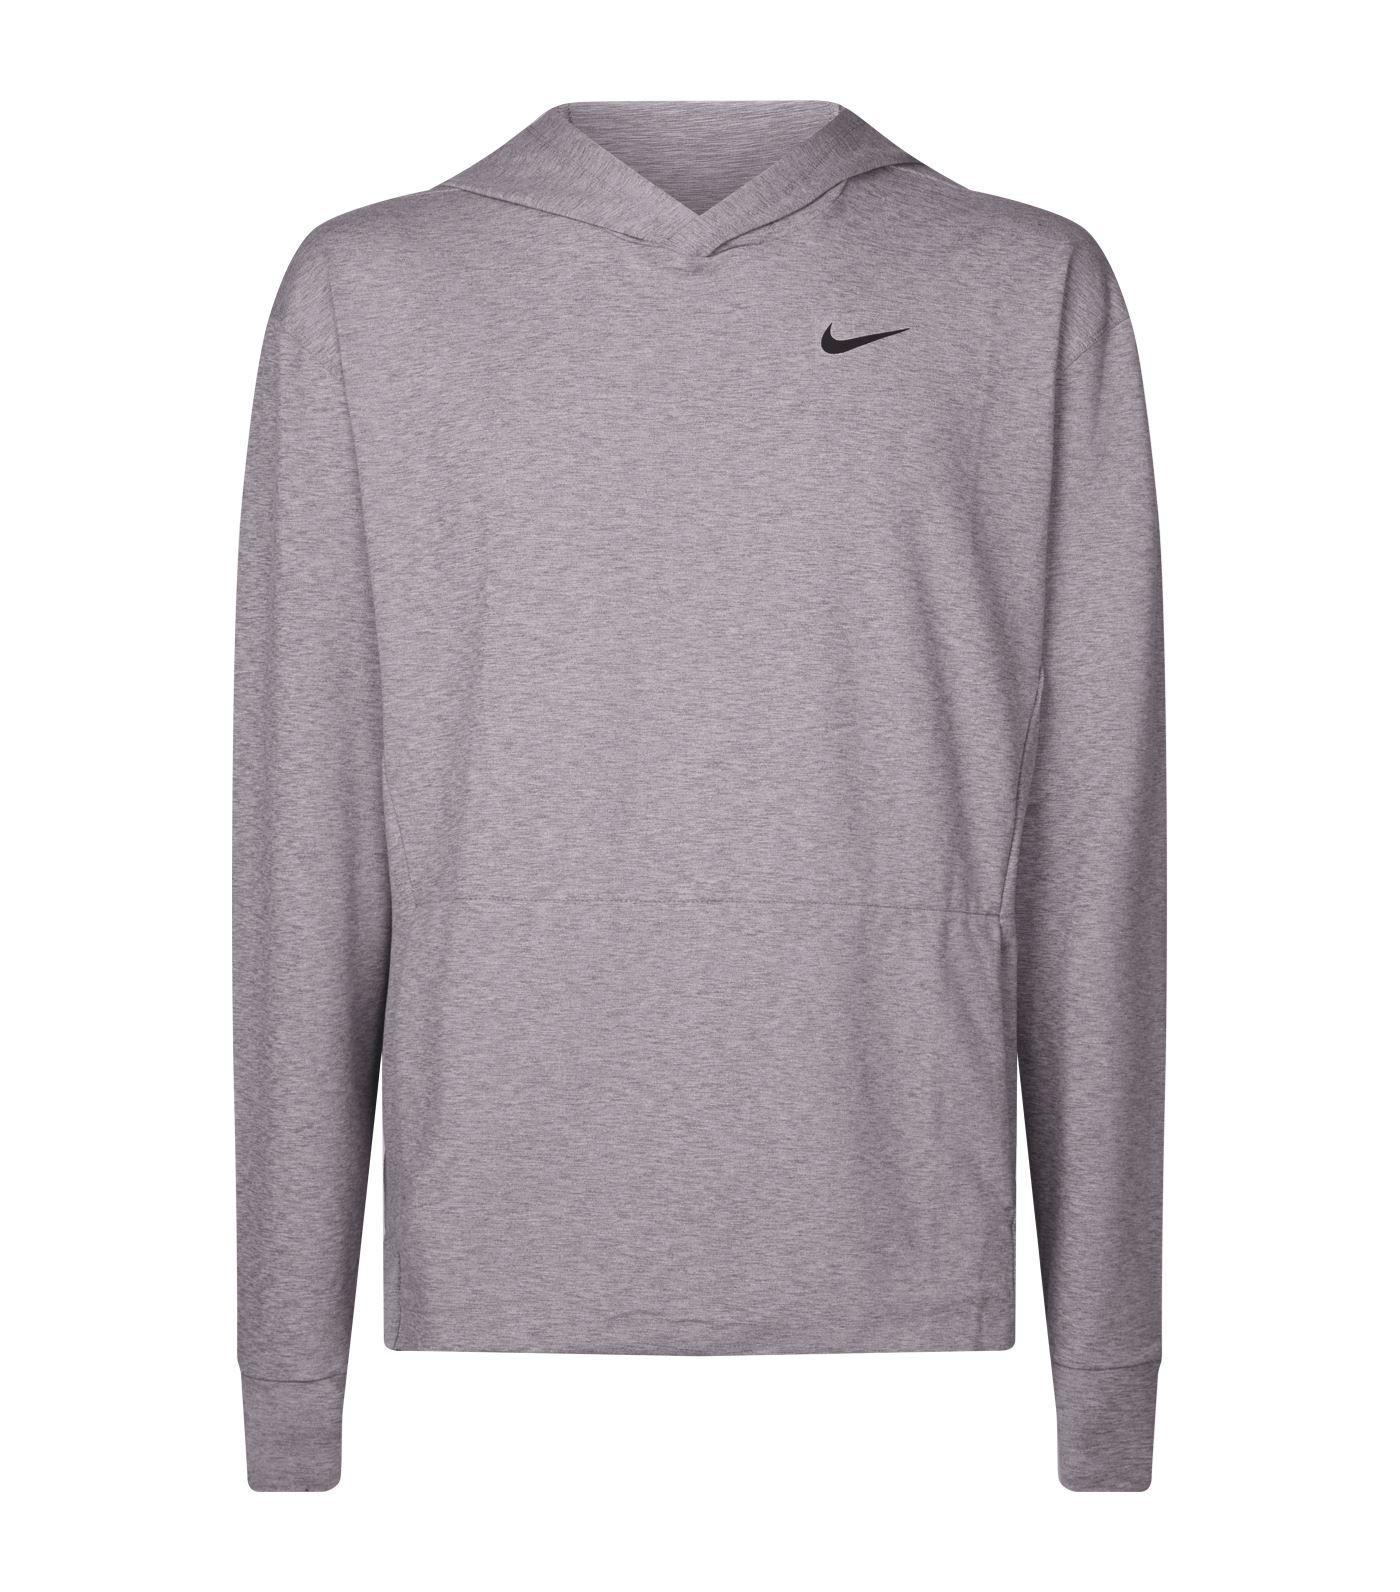 Nike drifit hoodie nike cloth nike dri fit hoodie